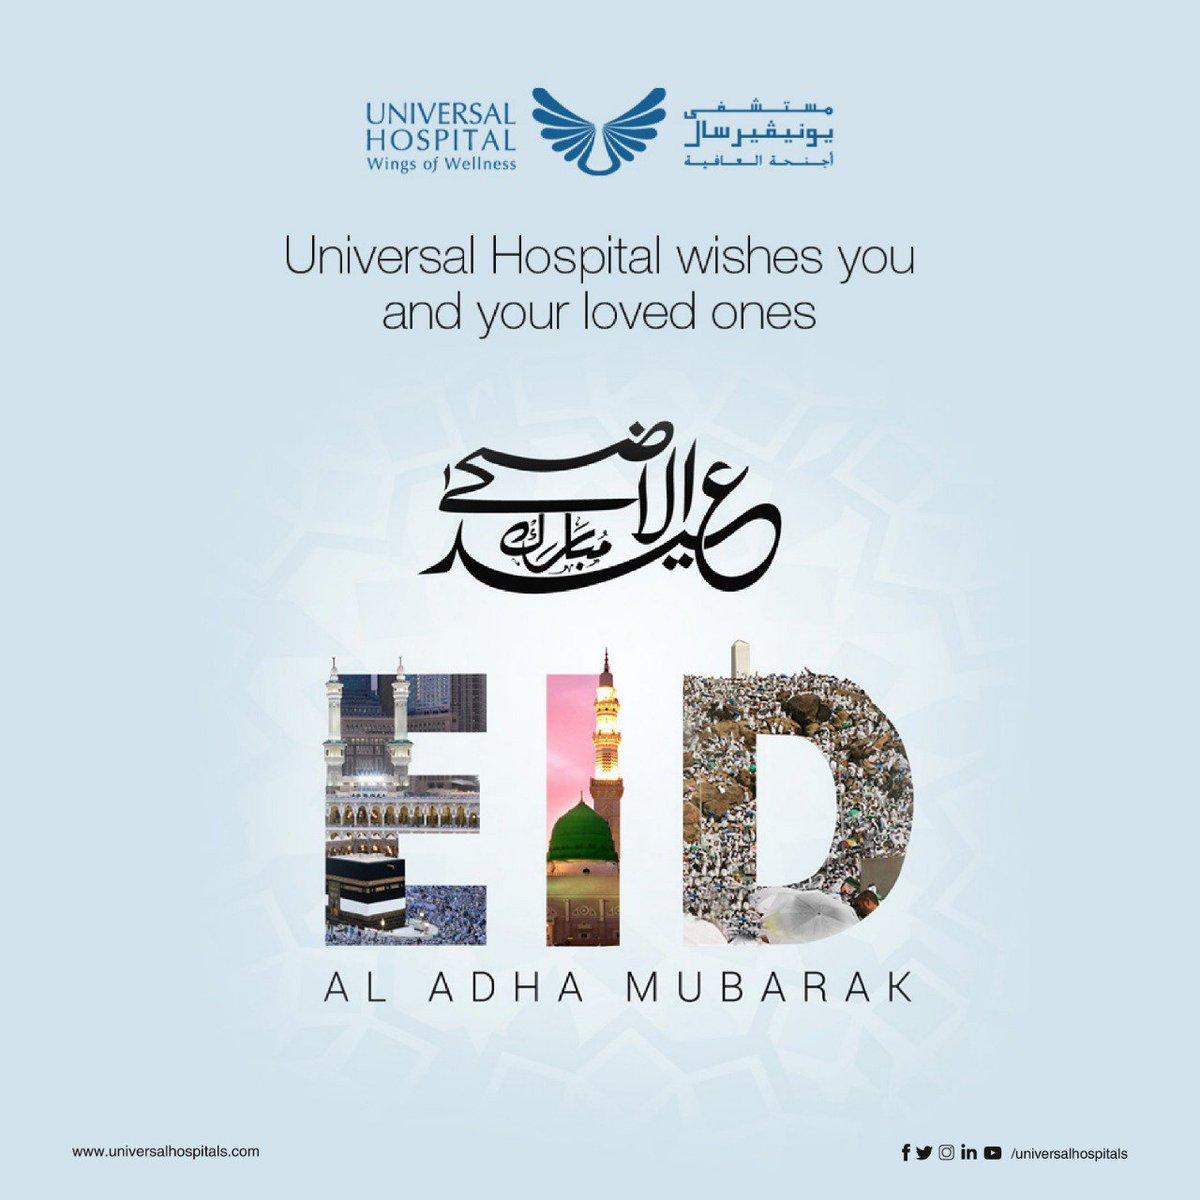 Universal Hospital sends its wishes of wellness to everyone this Eid Al-Adha.  May the Auspicious Occasion of Eid, bring you divine blessings of Hope, Faith, and Good Health.  Eid Mubarak!  #Eidmubarak #Eid #Holidays #eid #eidaladha #holy #festival #twentyfourseven #clinics